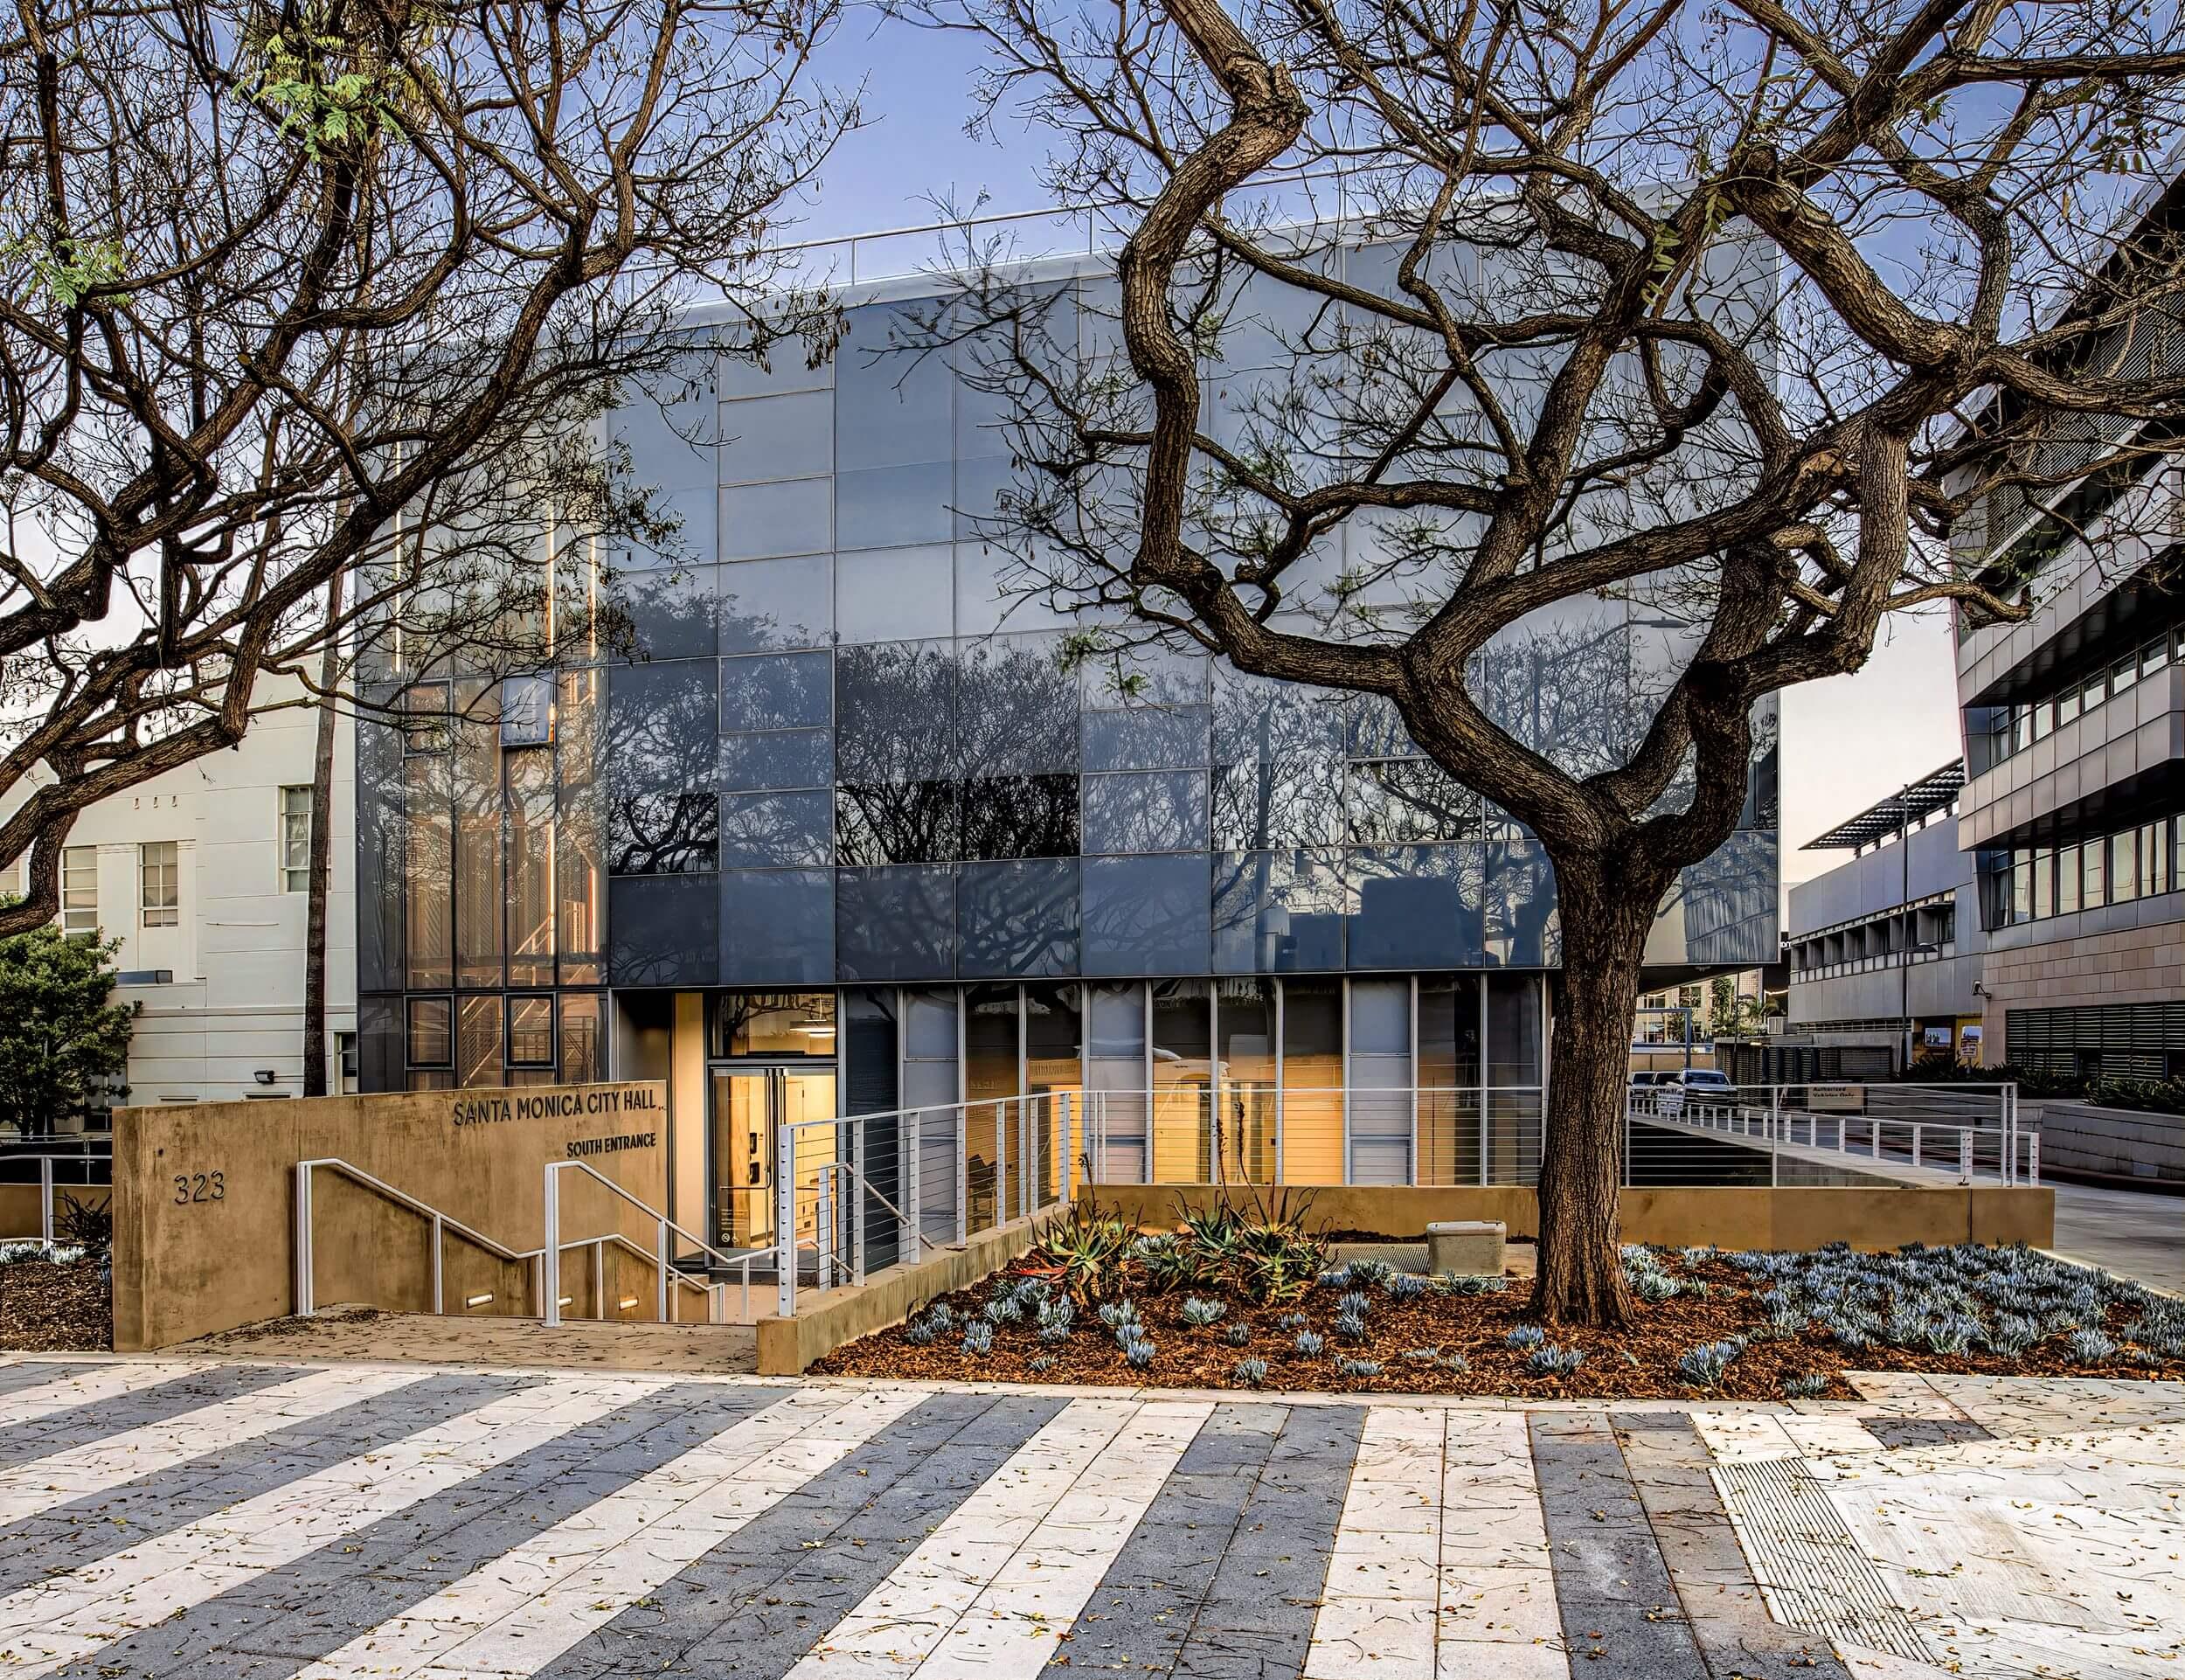 Exterior of a reflective civil services building